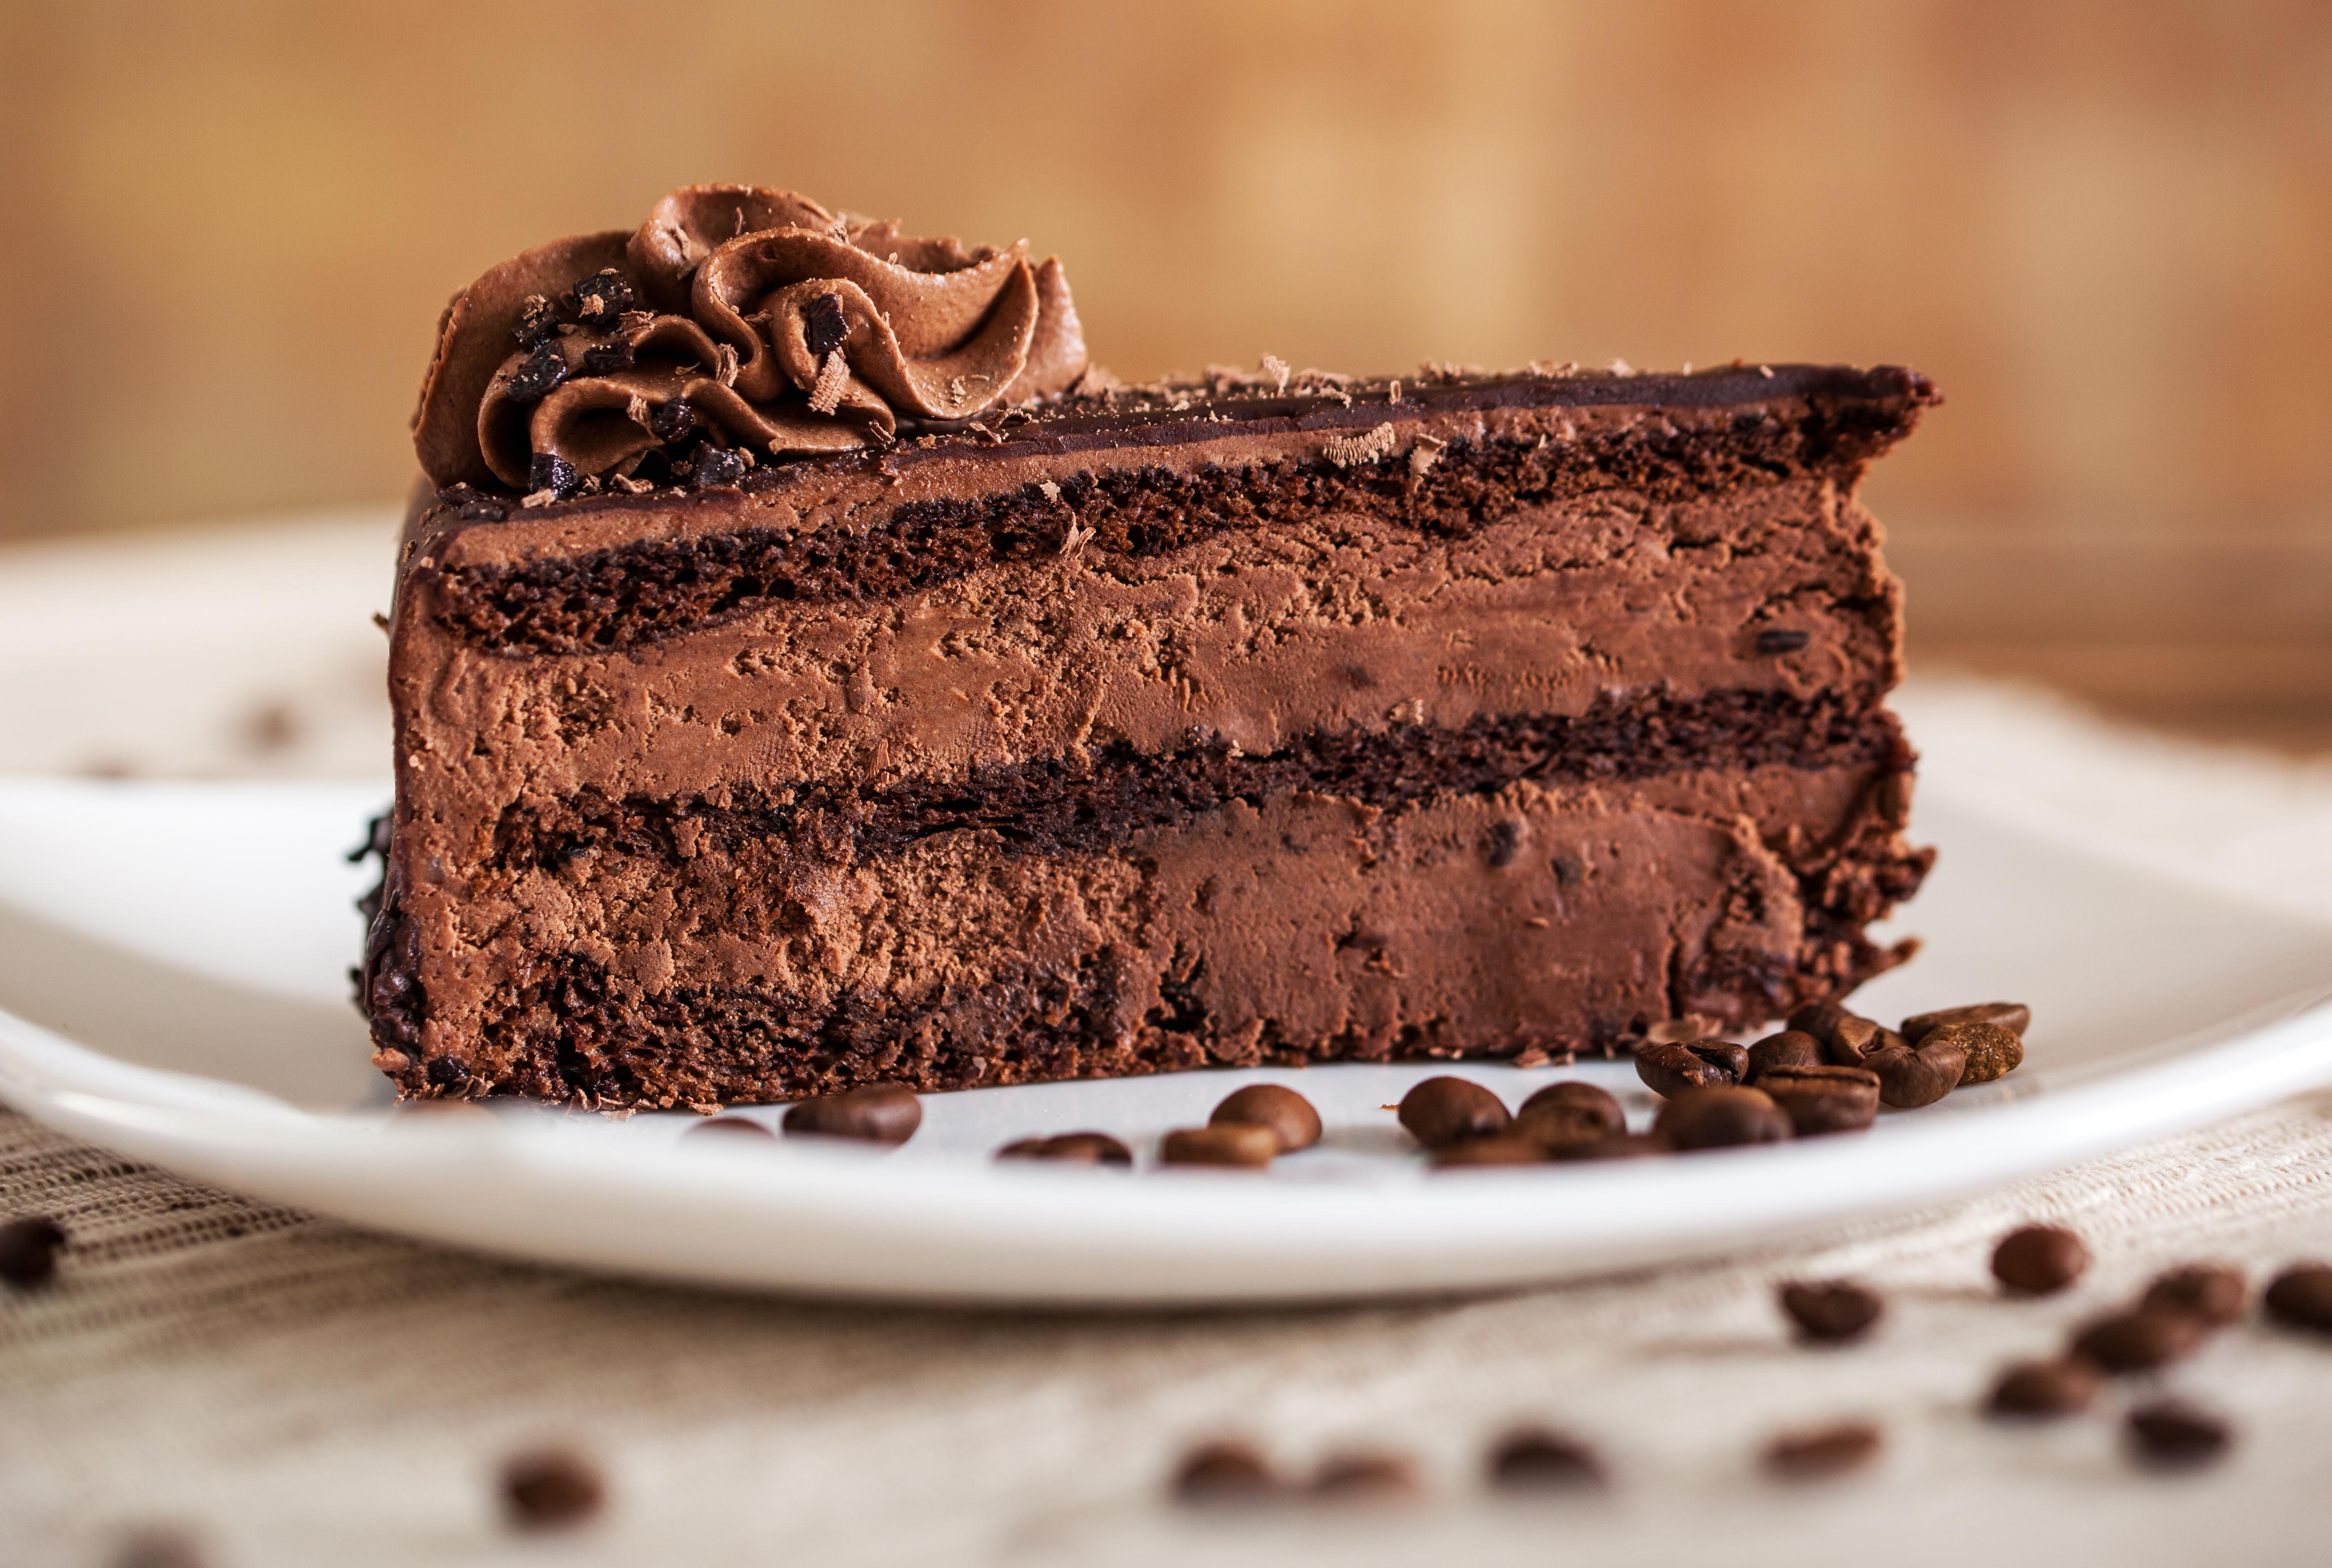 Chocolate Cake Stomach Ache